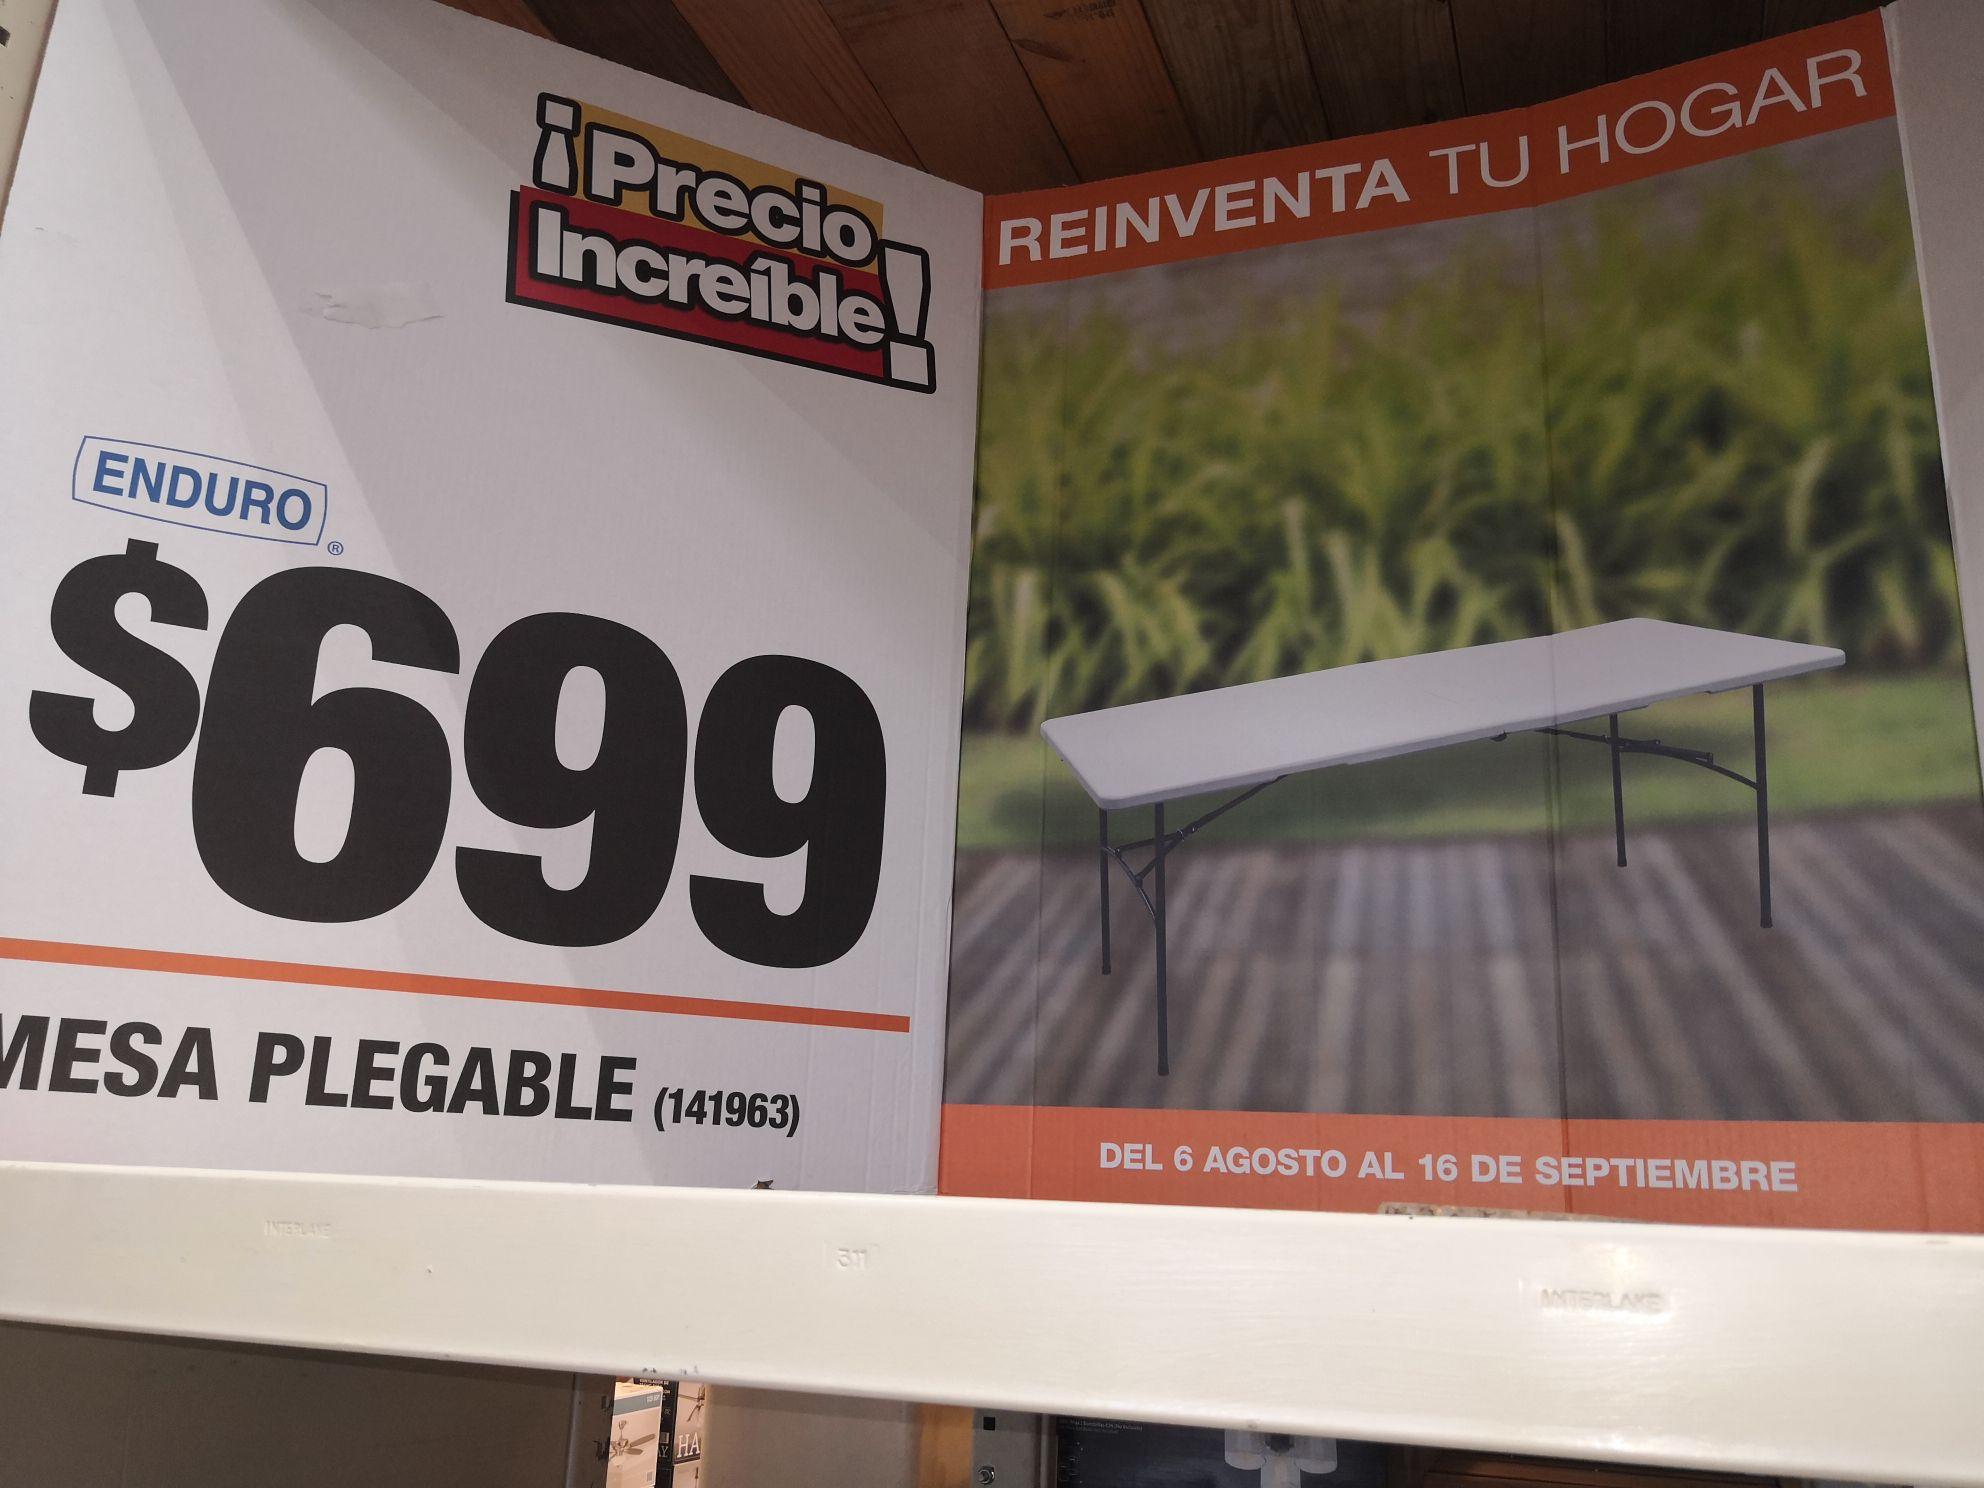 Home Depot: Mesa plegable